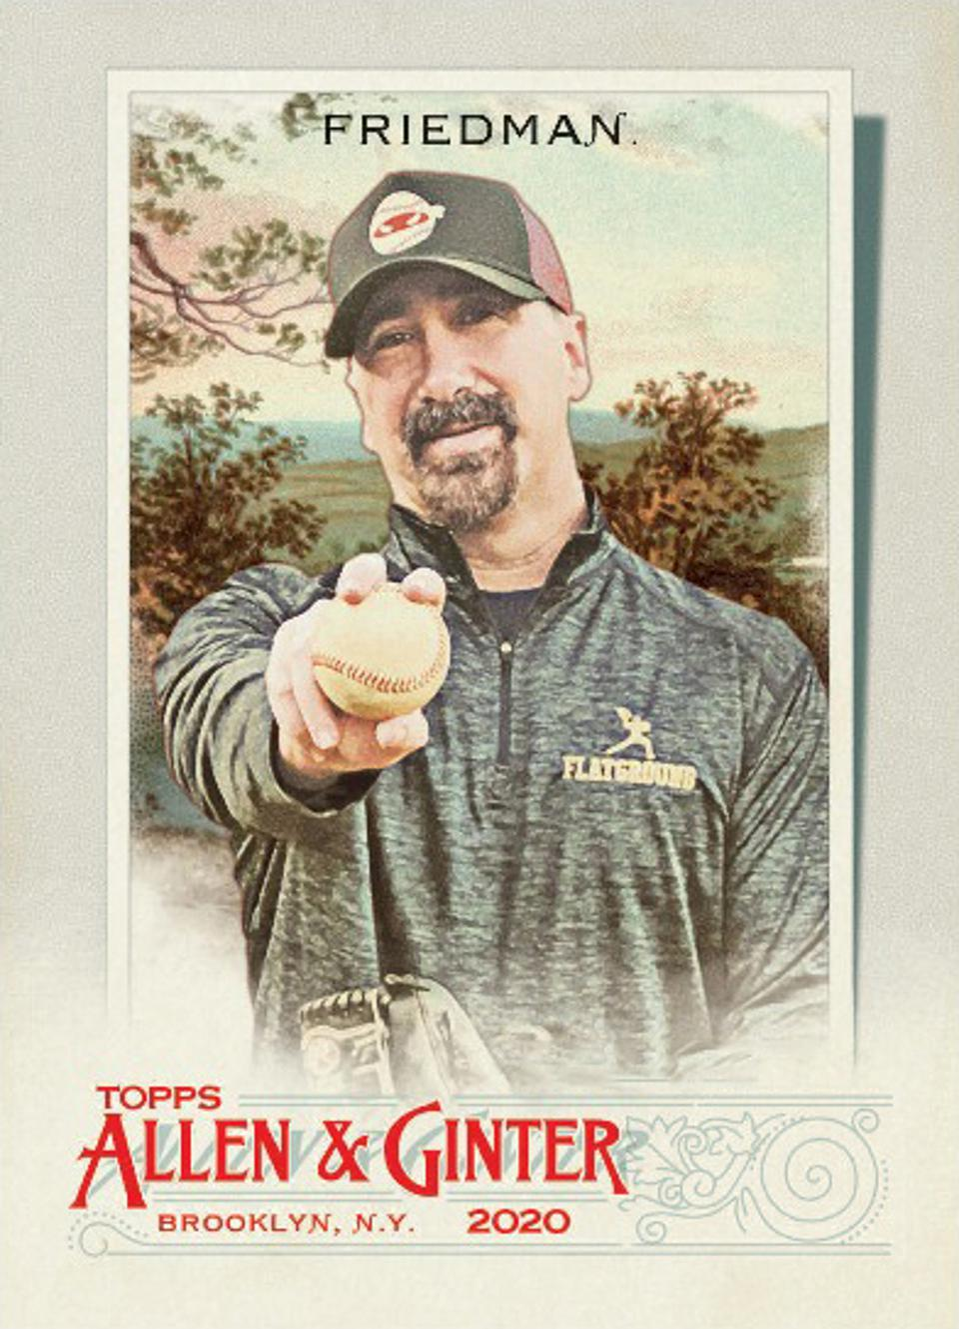 Rob Friedman aka PitchingNinja, 2020 Topps Allen and Ginter baseball card.